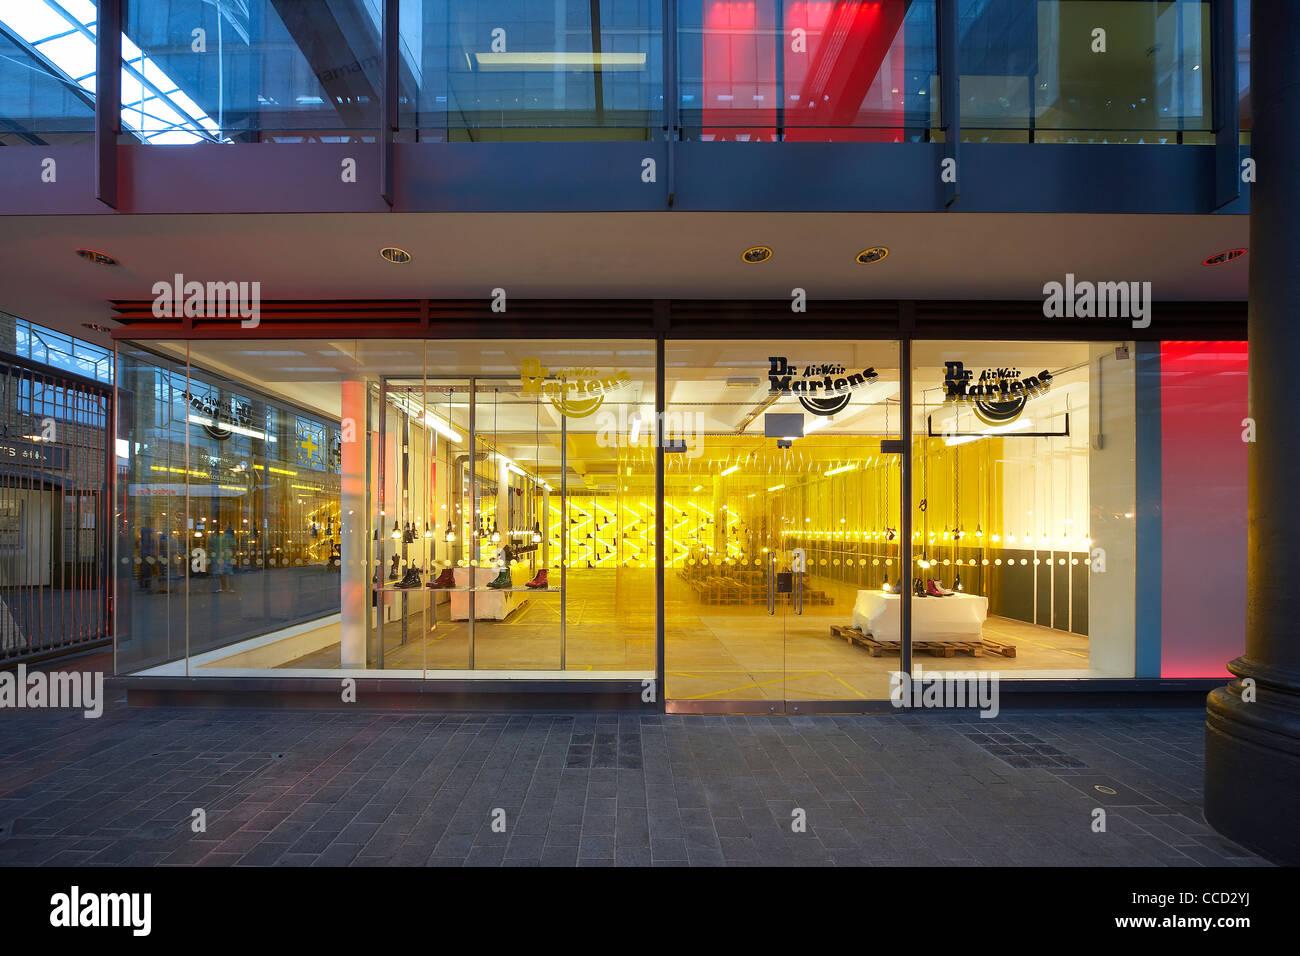 Nice Dr Marten Pop Up Store Campaign Design Spitalfields London Uk 2009 Exterior  View Shop Front Showing Interior Illuminated Inside